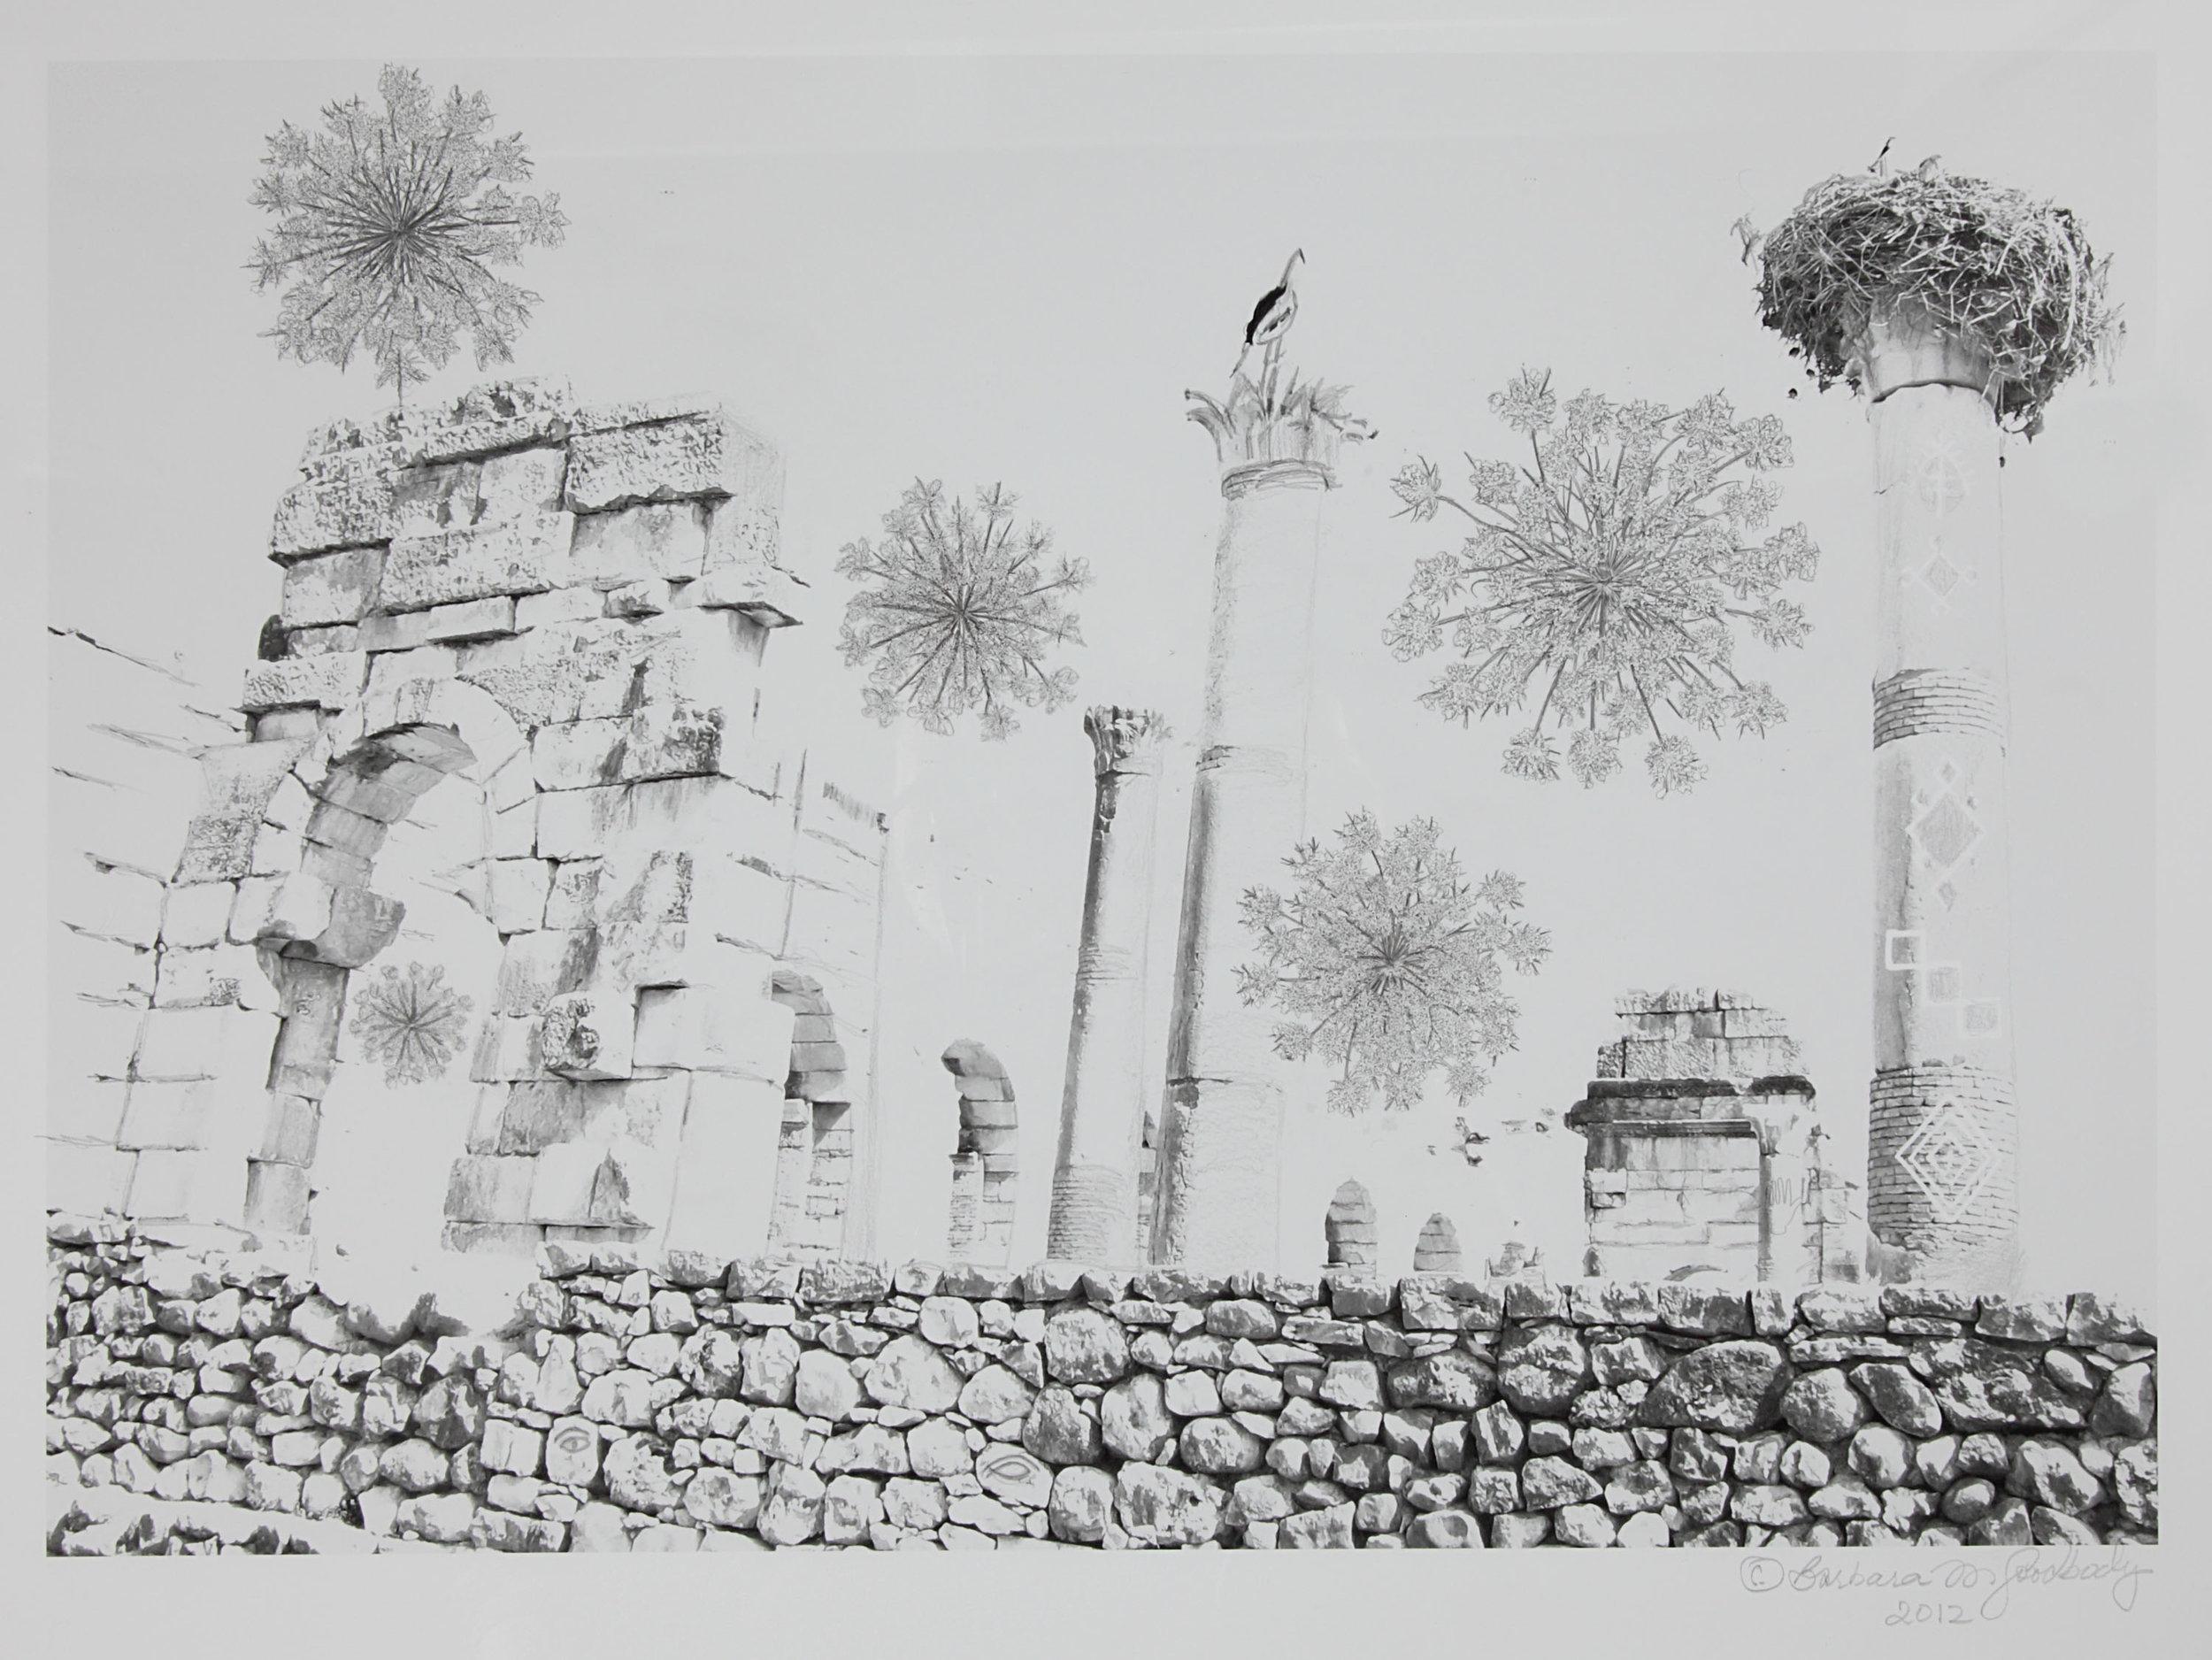 Barbara Goodbody,  Shared Memories  portfolio, 2012, 6/5, Ink jet print, 19.5 x 14 inches